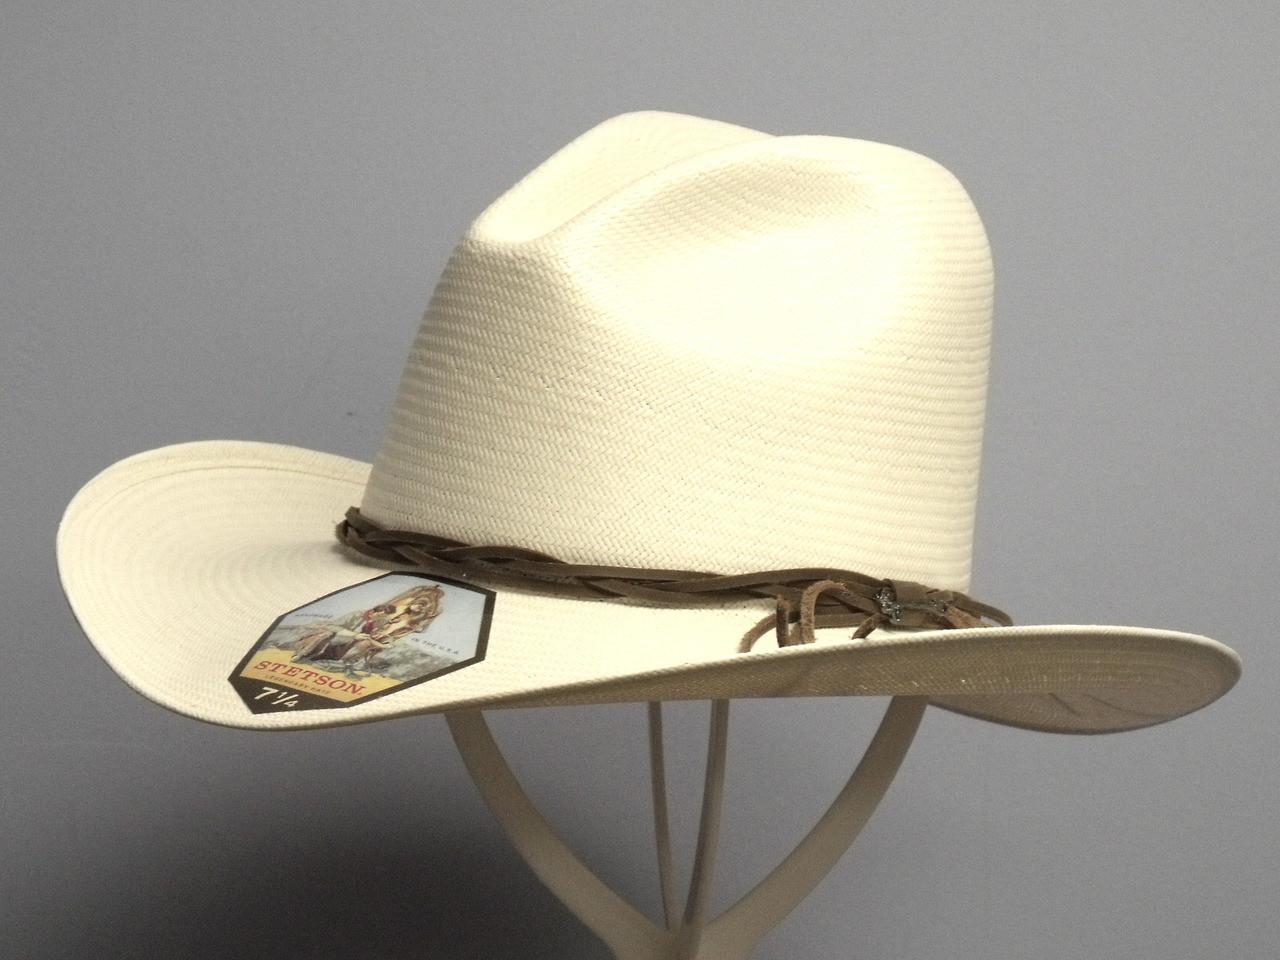 d44197442 Stetson Gus 10X Straw Cowboy Western Hat - One 2 mini Ranch